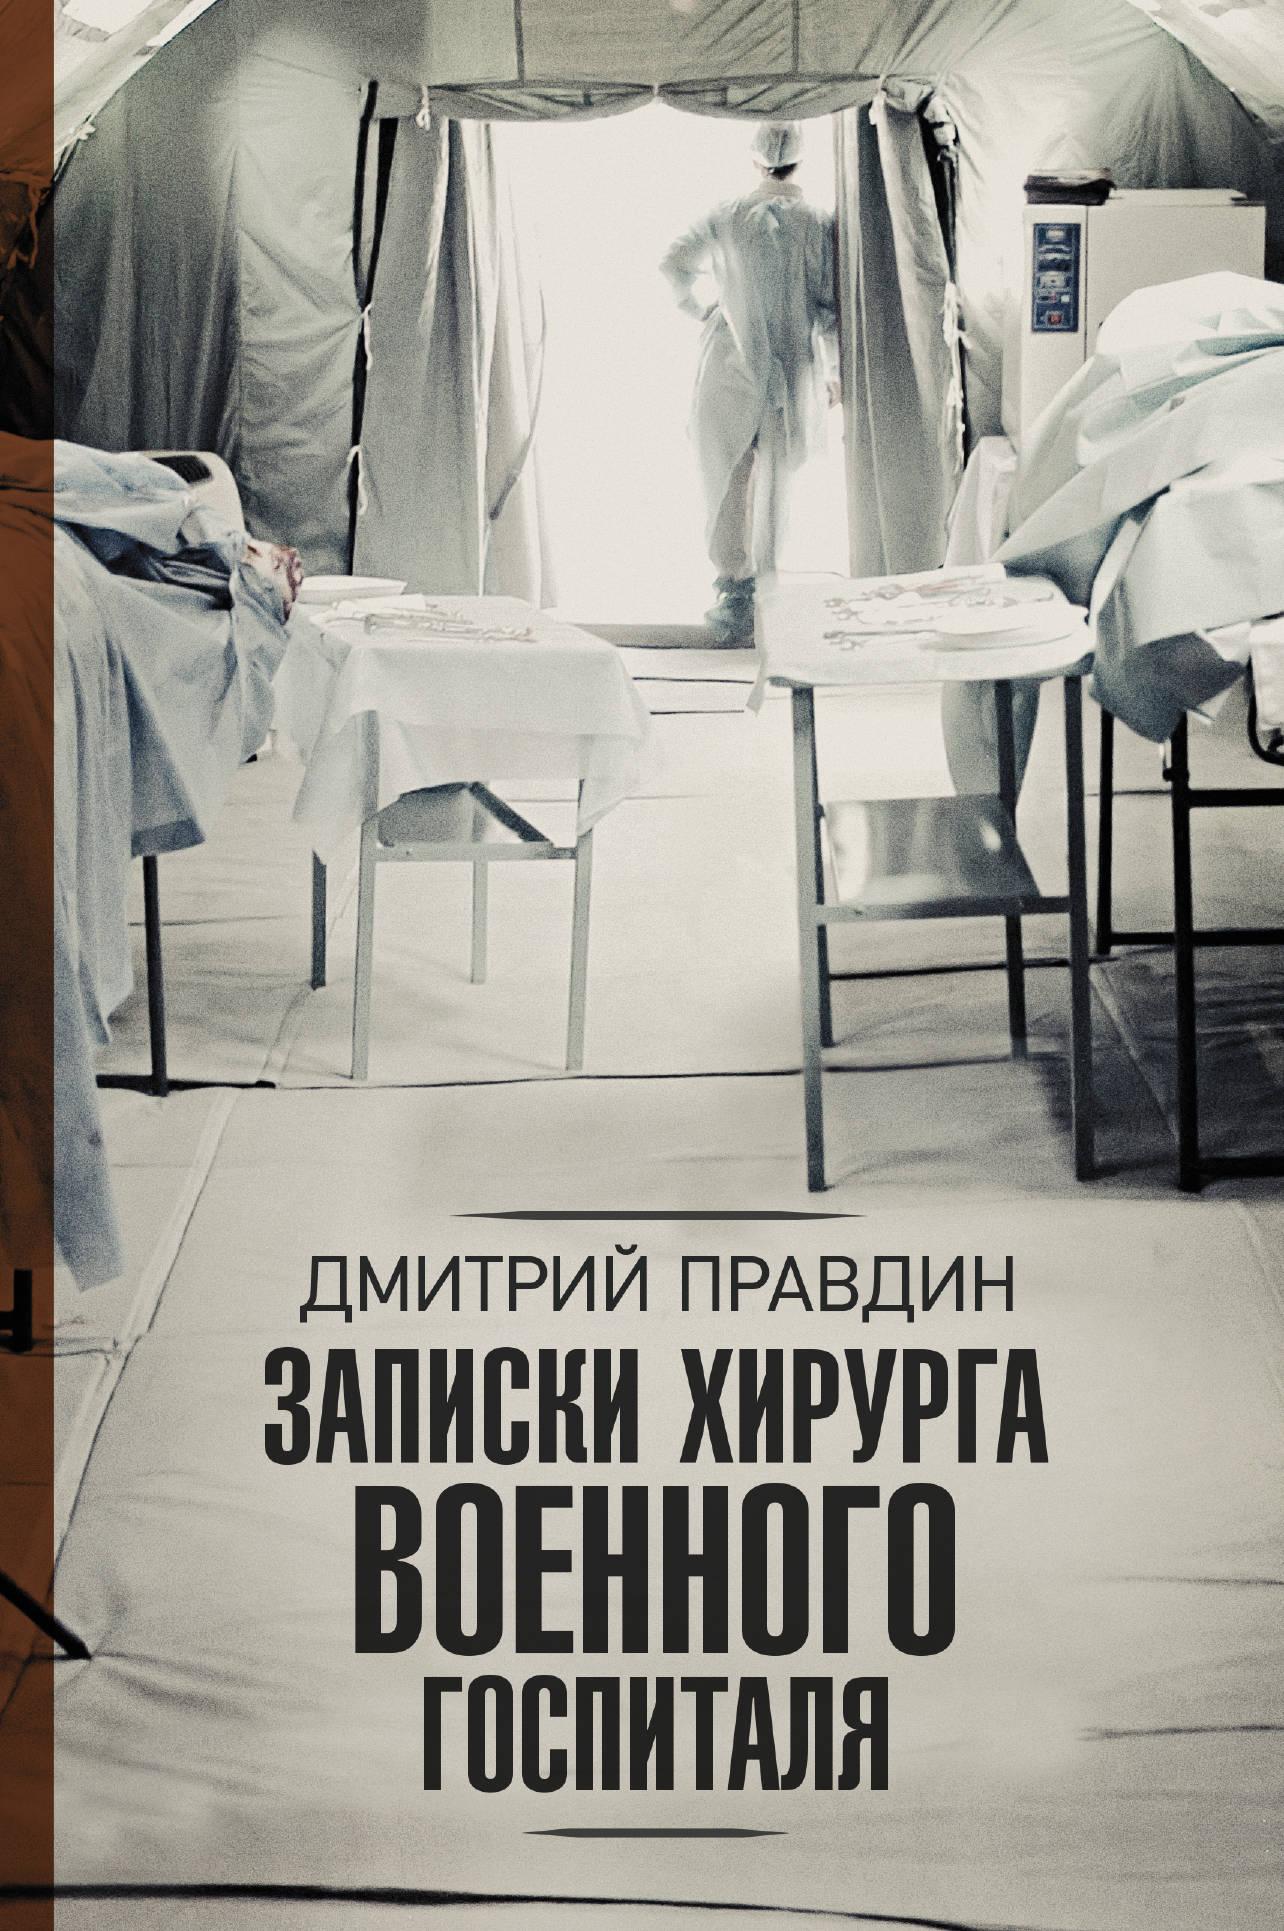 Записки хирурга военного госпиталя